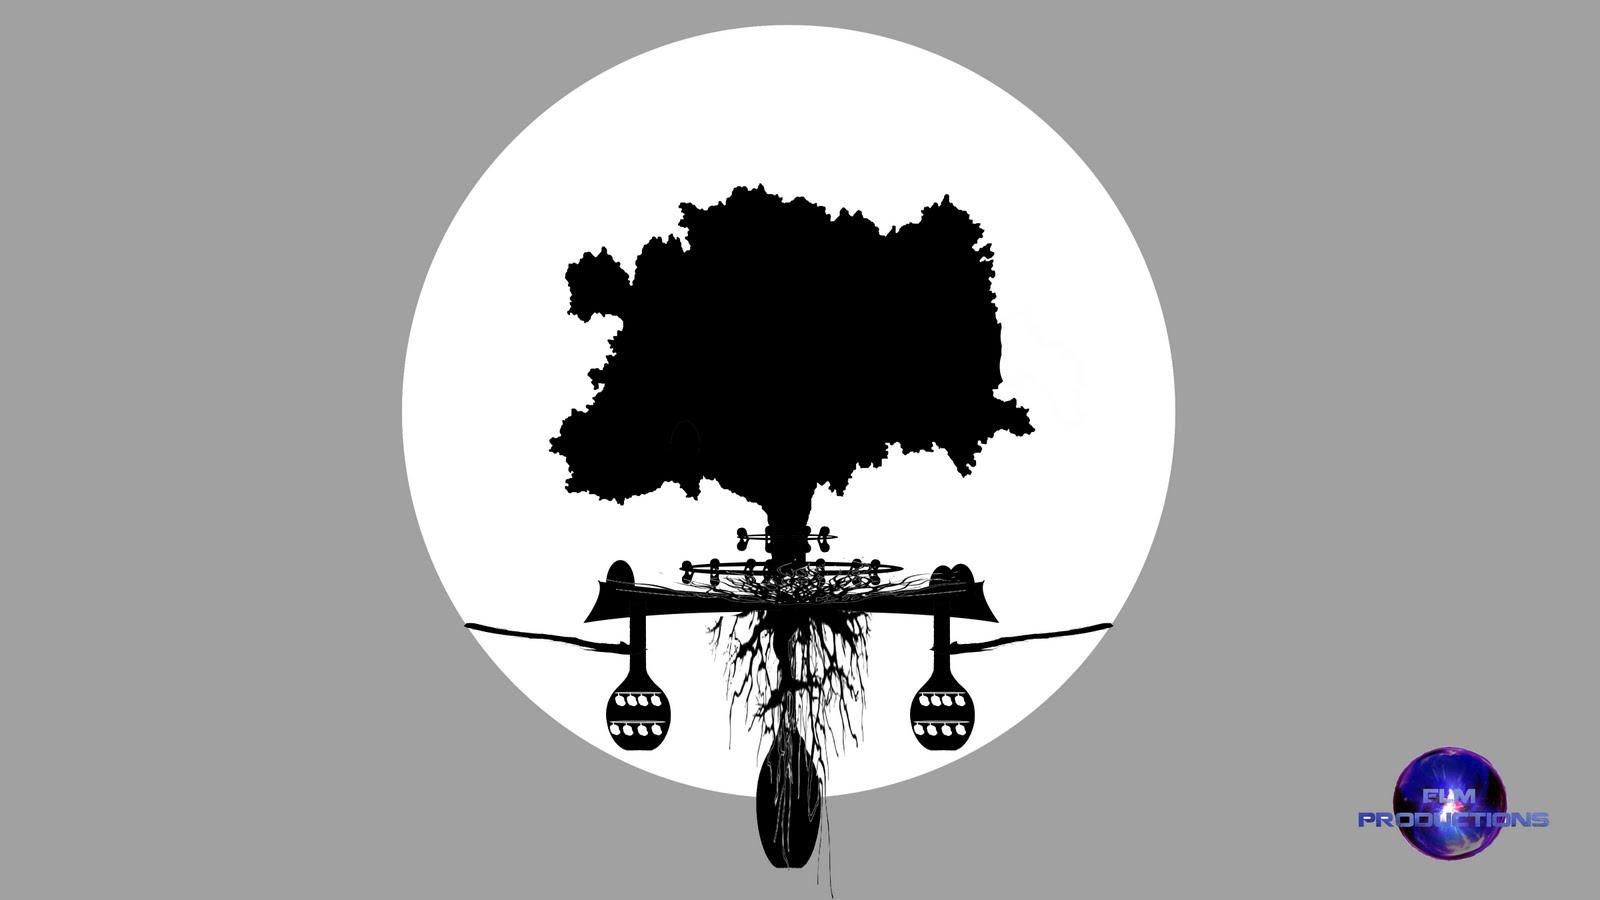 Yggdrasil Designs